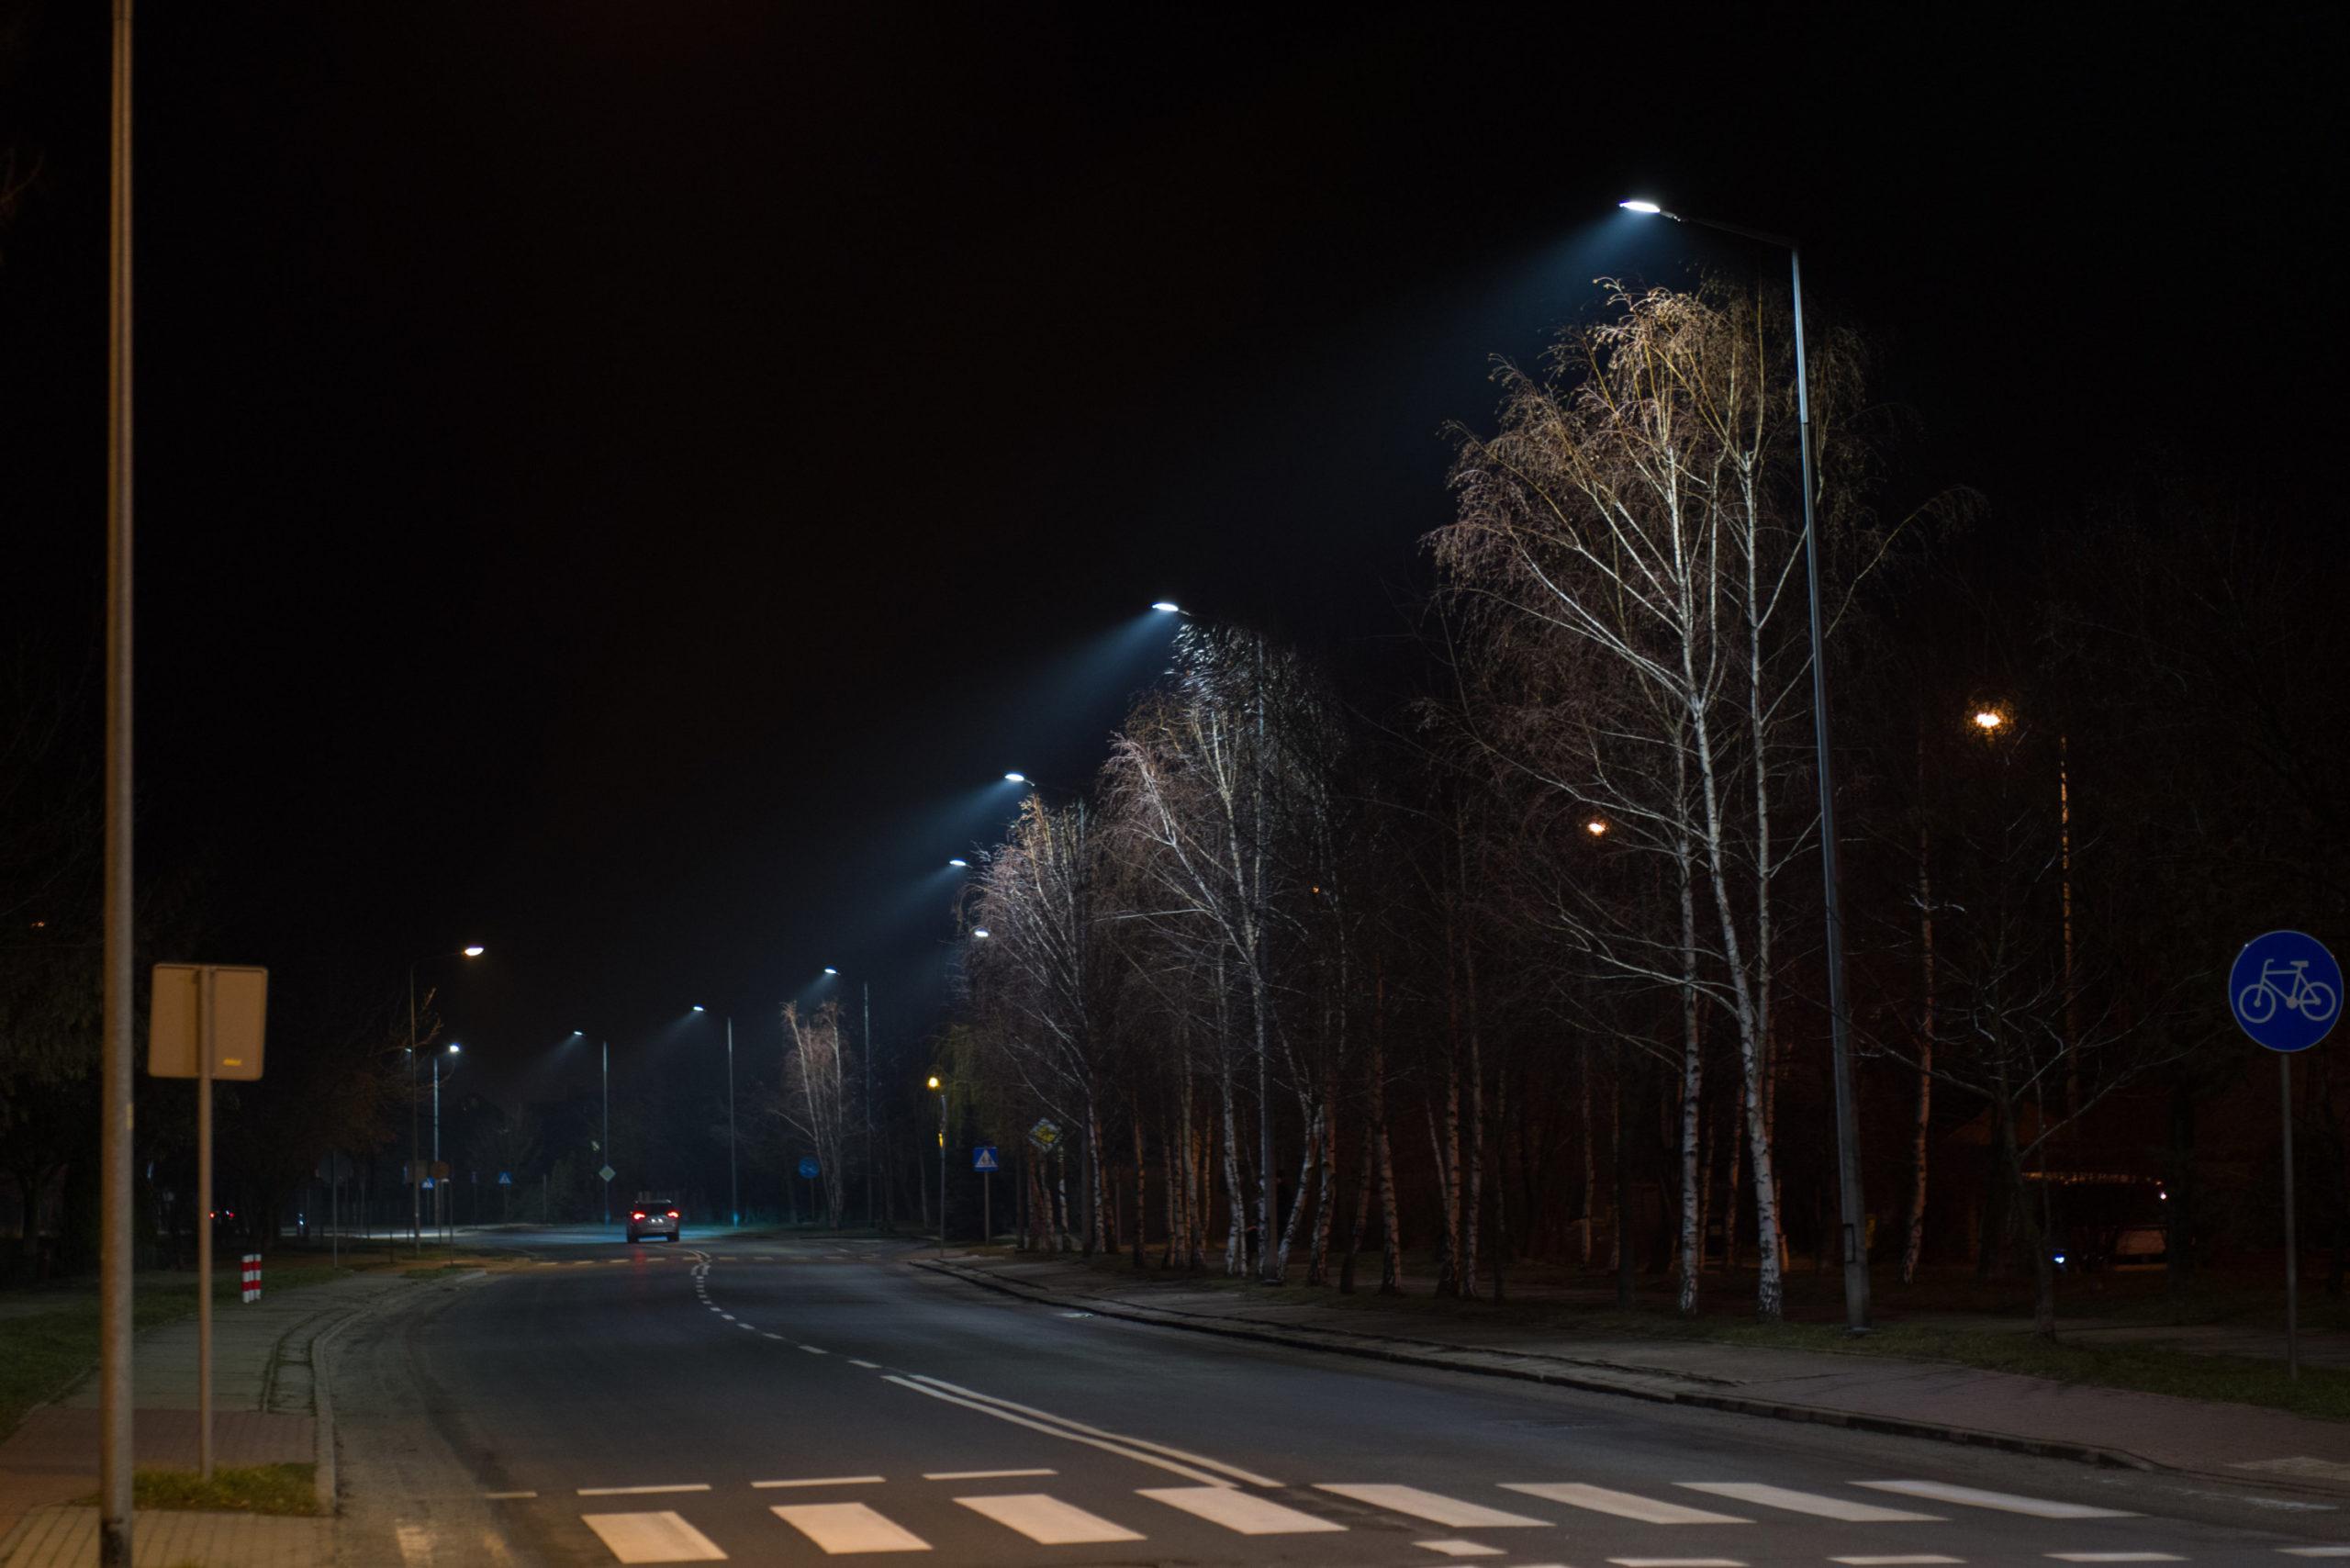 Modernisierung der LED Straßenbeleuchtung in Legnica